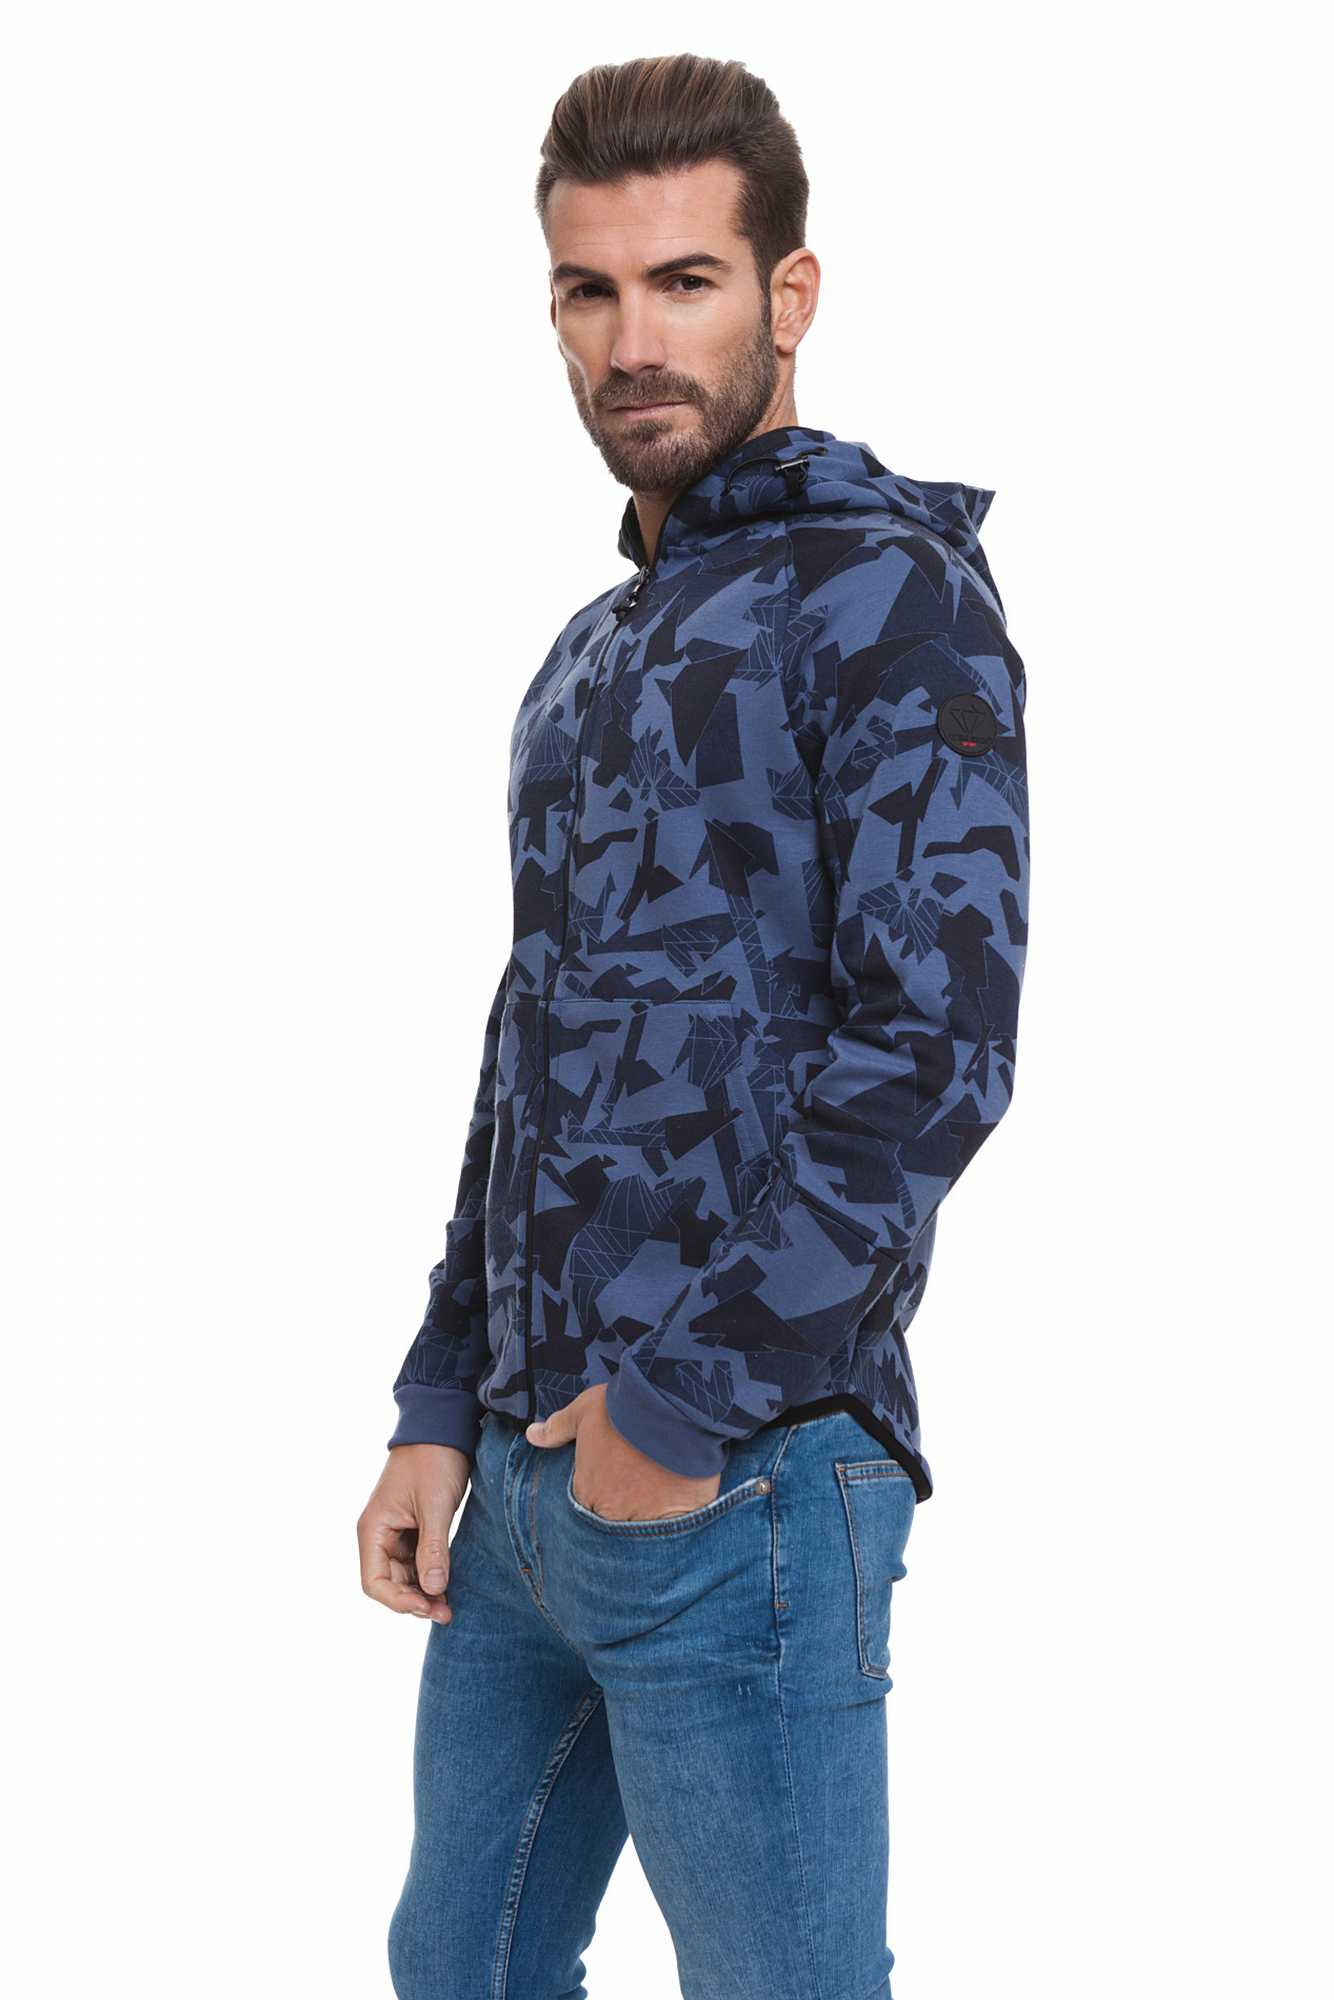 Born богатый балателли свитер для мужчин темно синий спортивный BR2E111087AA2BRC 2 - 2